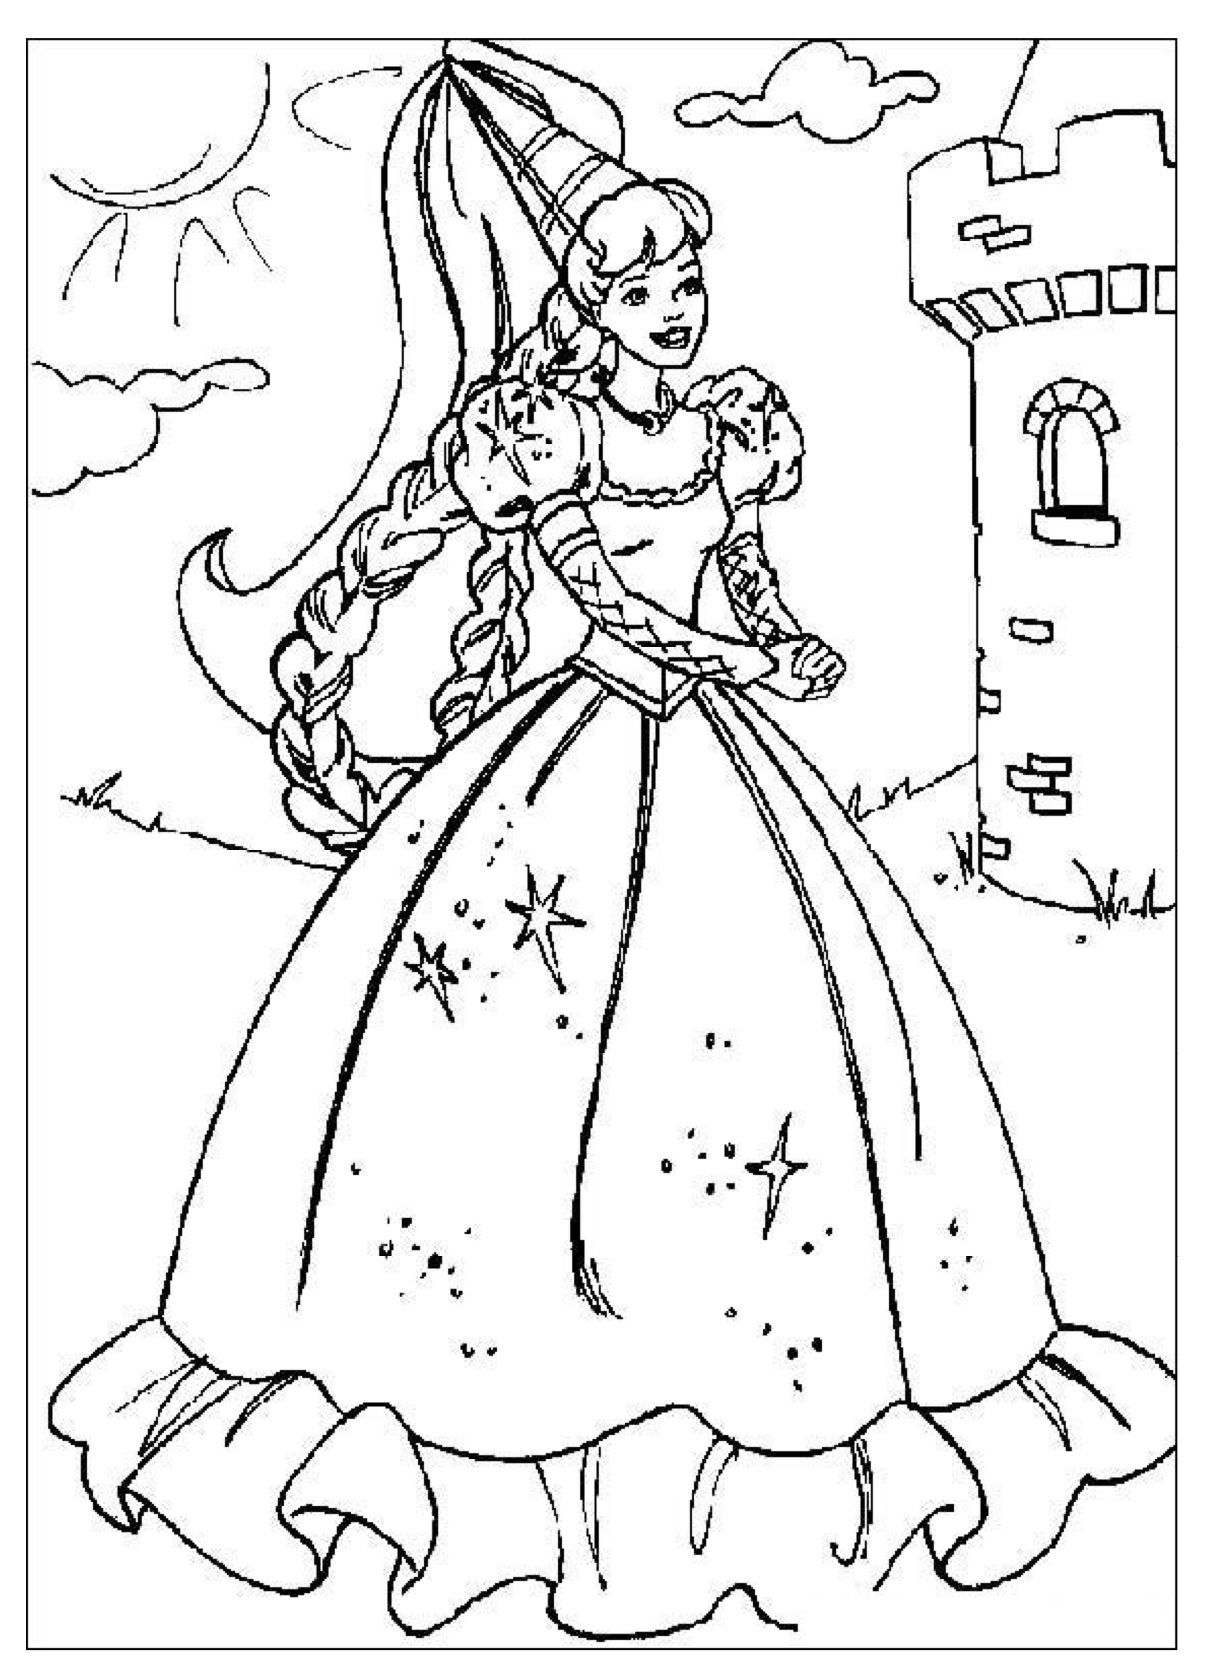 kleurplaten ridders en jonkvrouwen